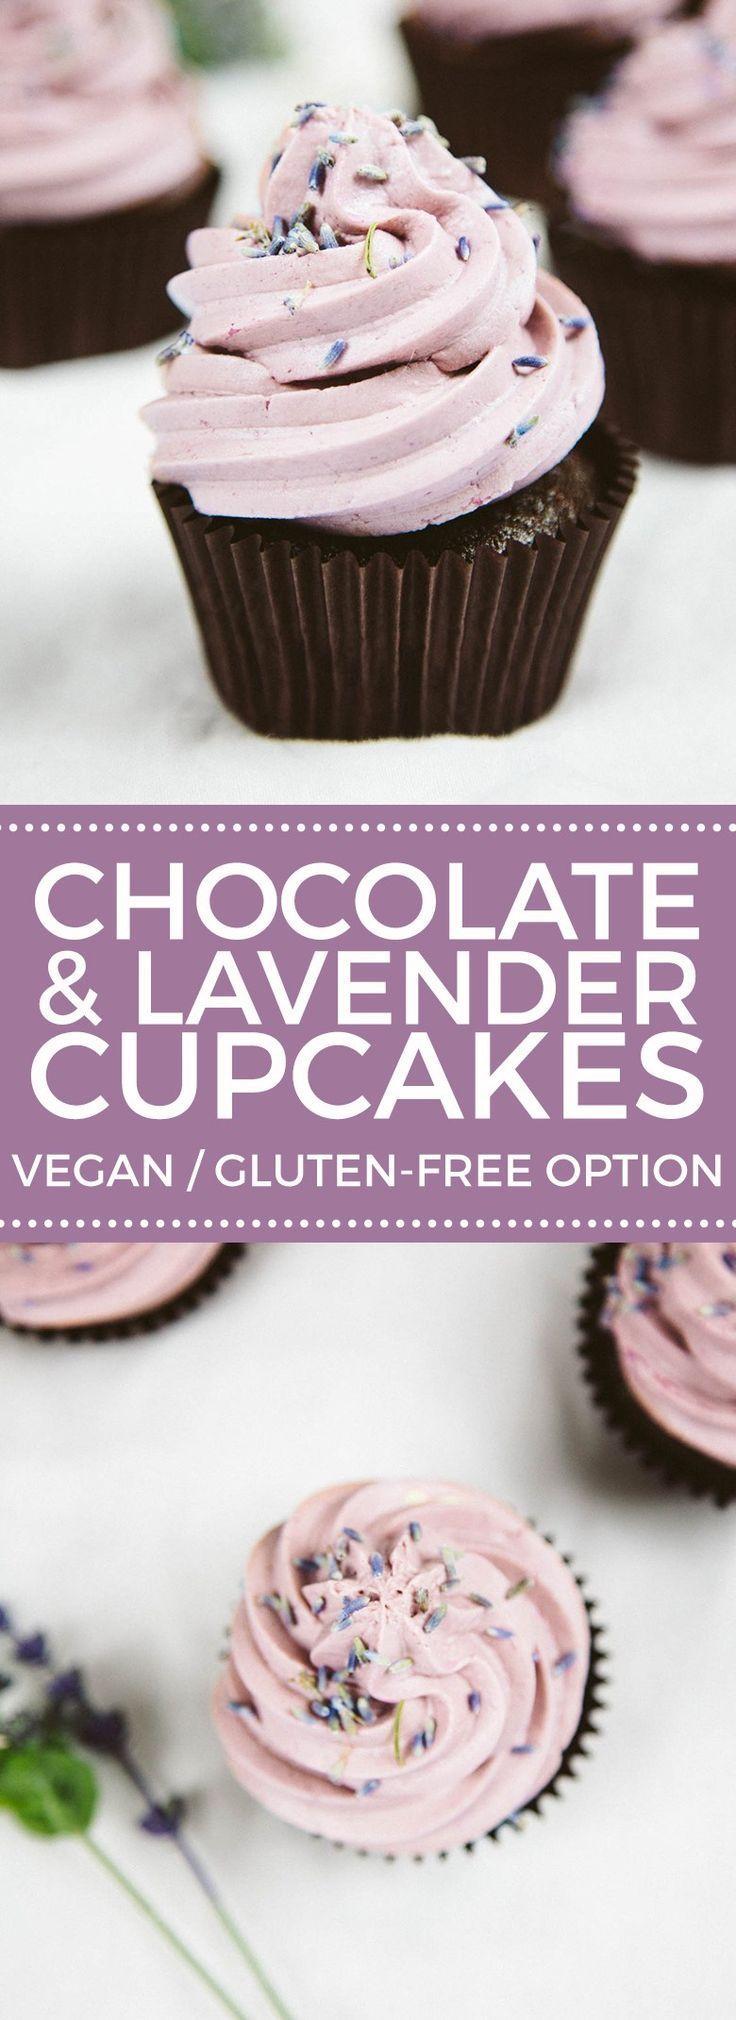 Vegan Chocolate Lavender Cupcakes (Gluten-free Option) Recipe